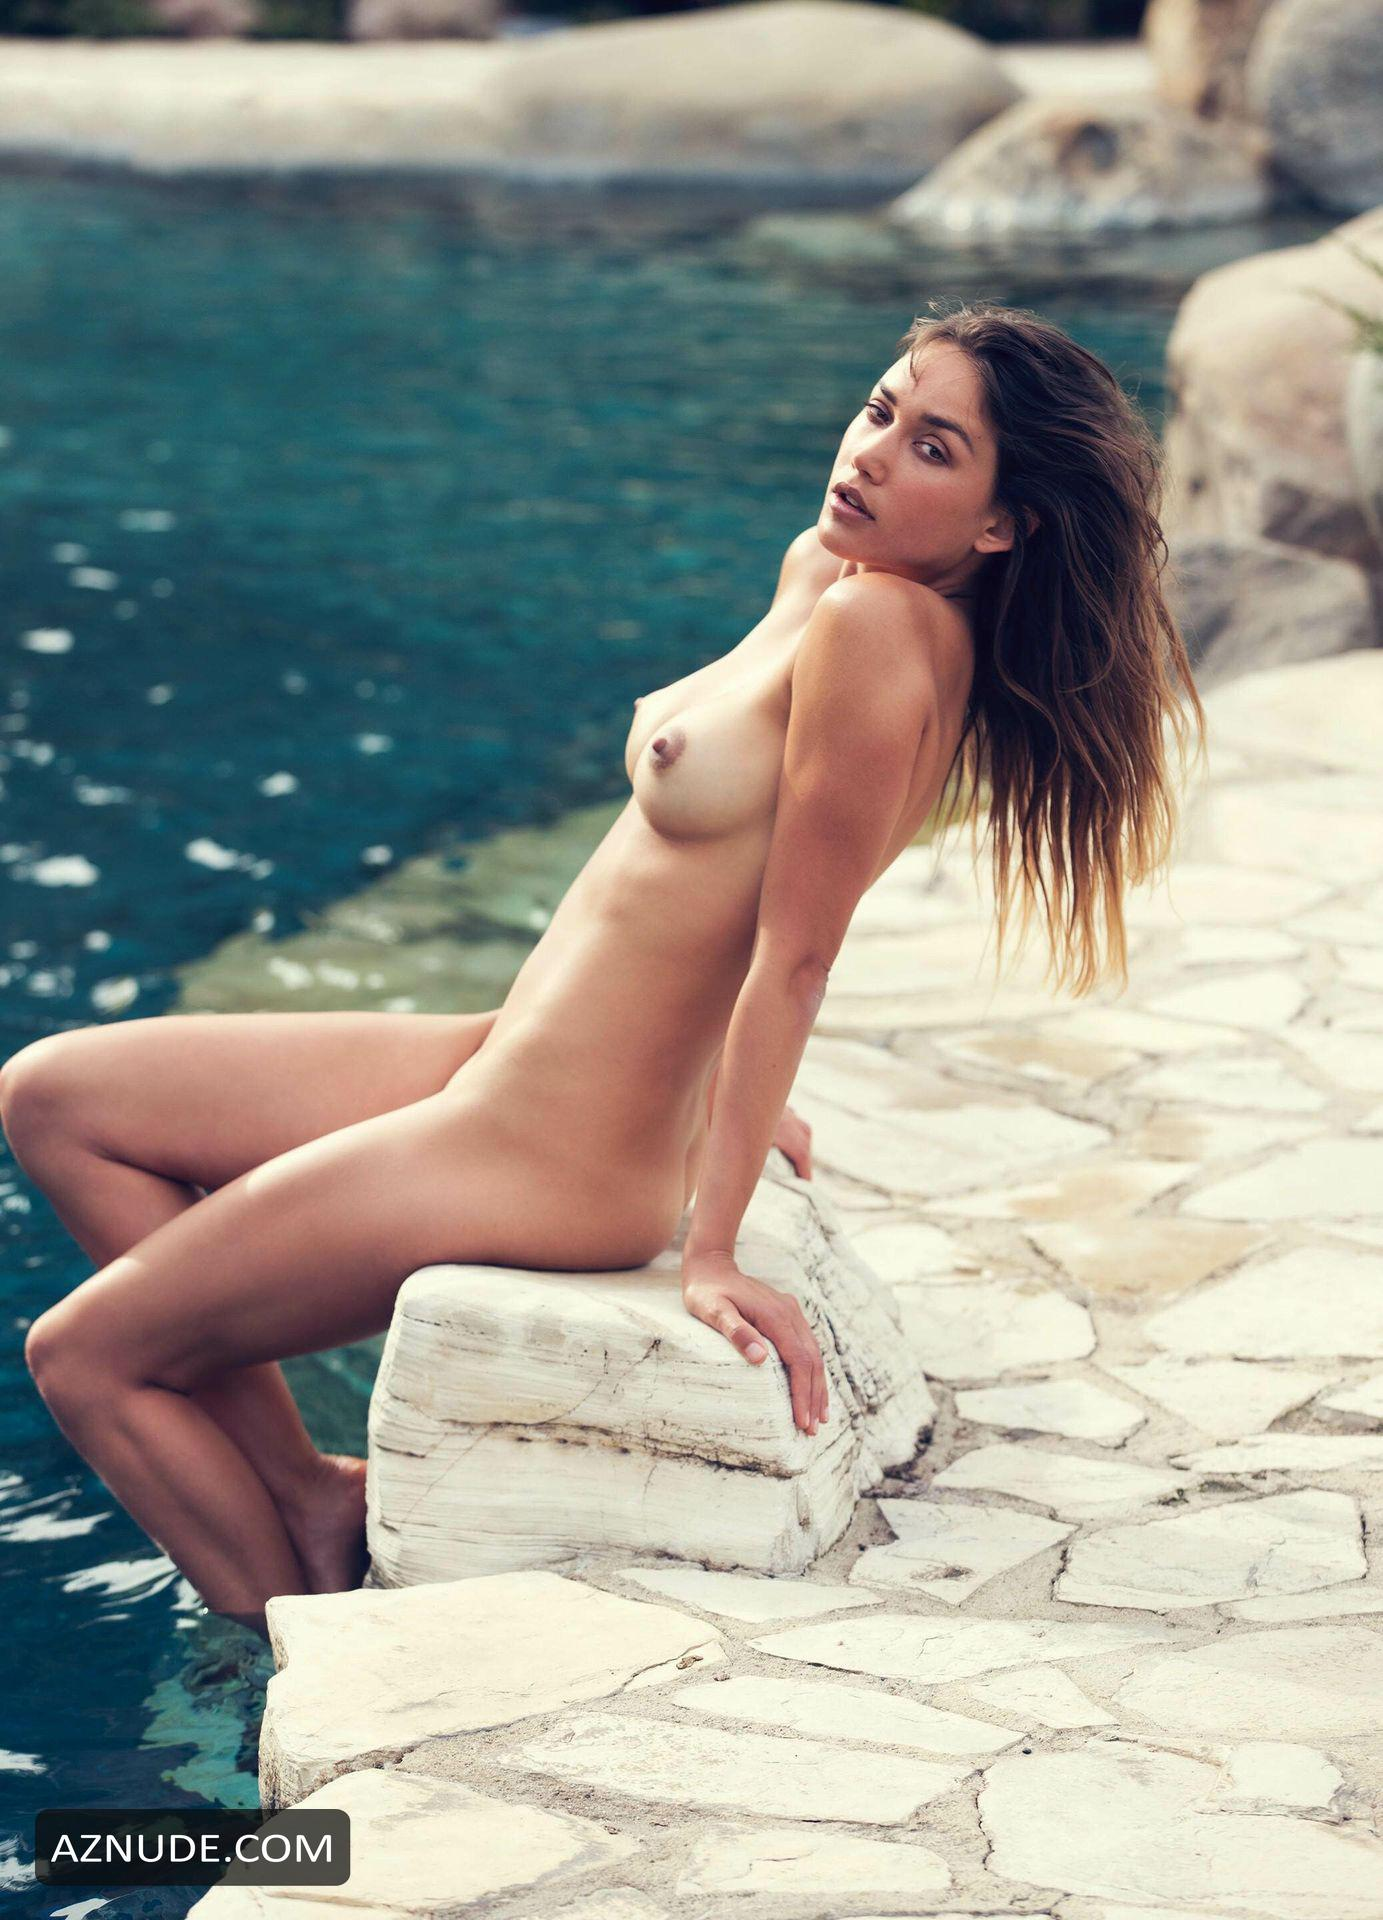 Celeb Brook Power Nude Playboy Images